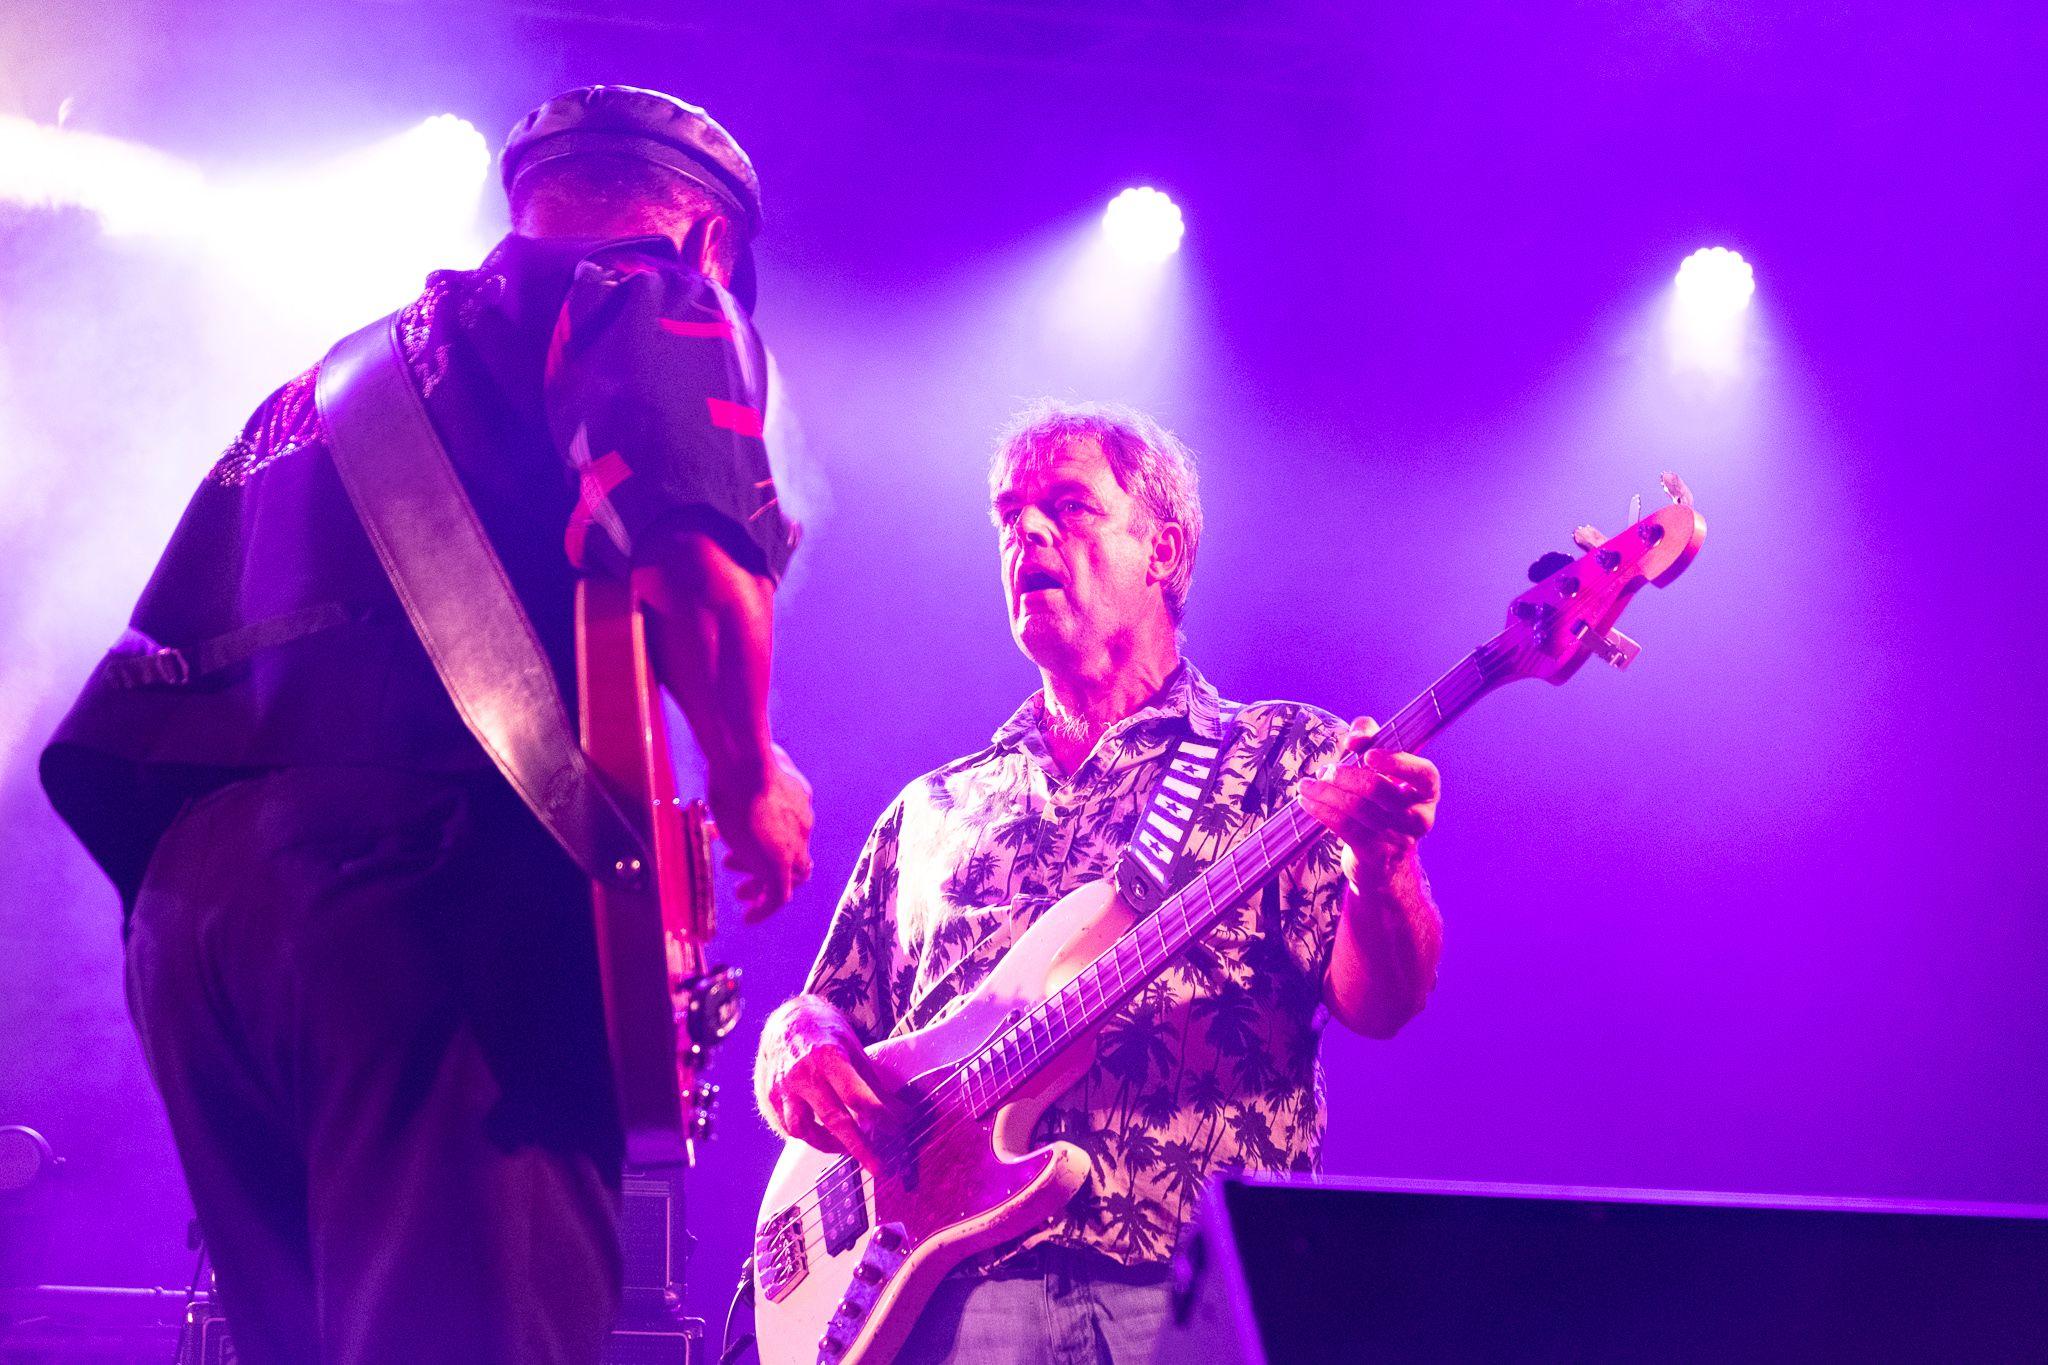 La banda SaRon Crenshaw tocant. FOTO: Ale Gómez